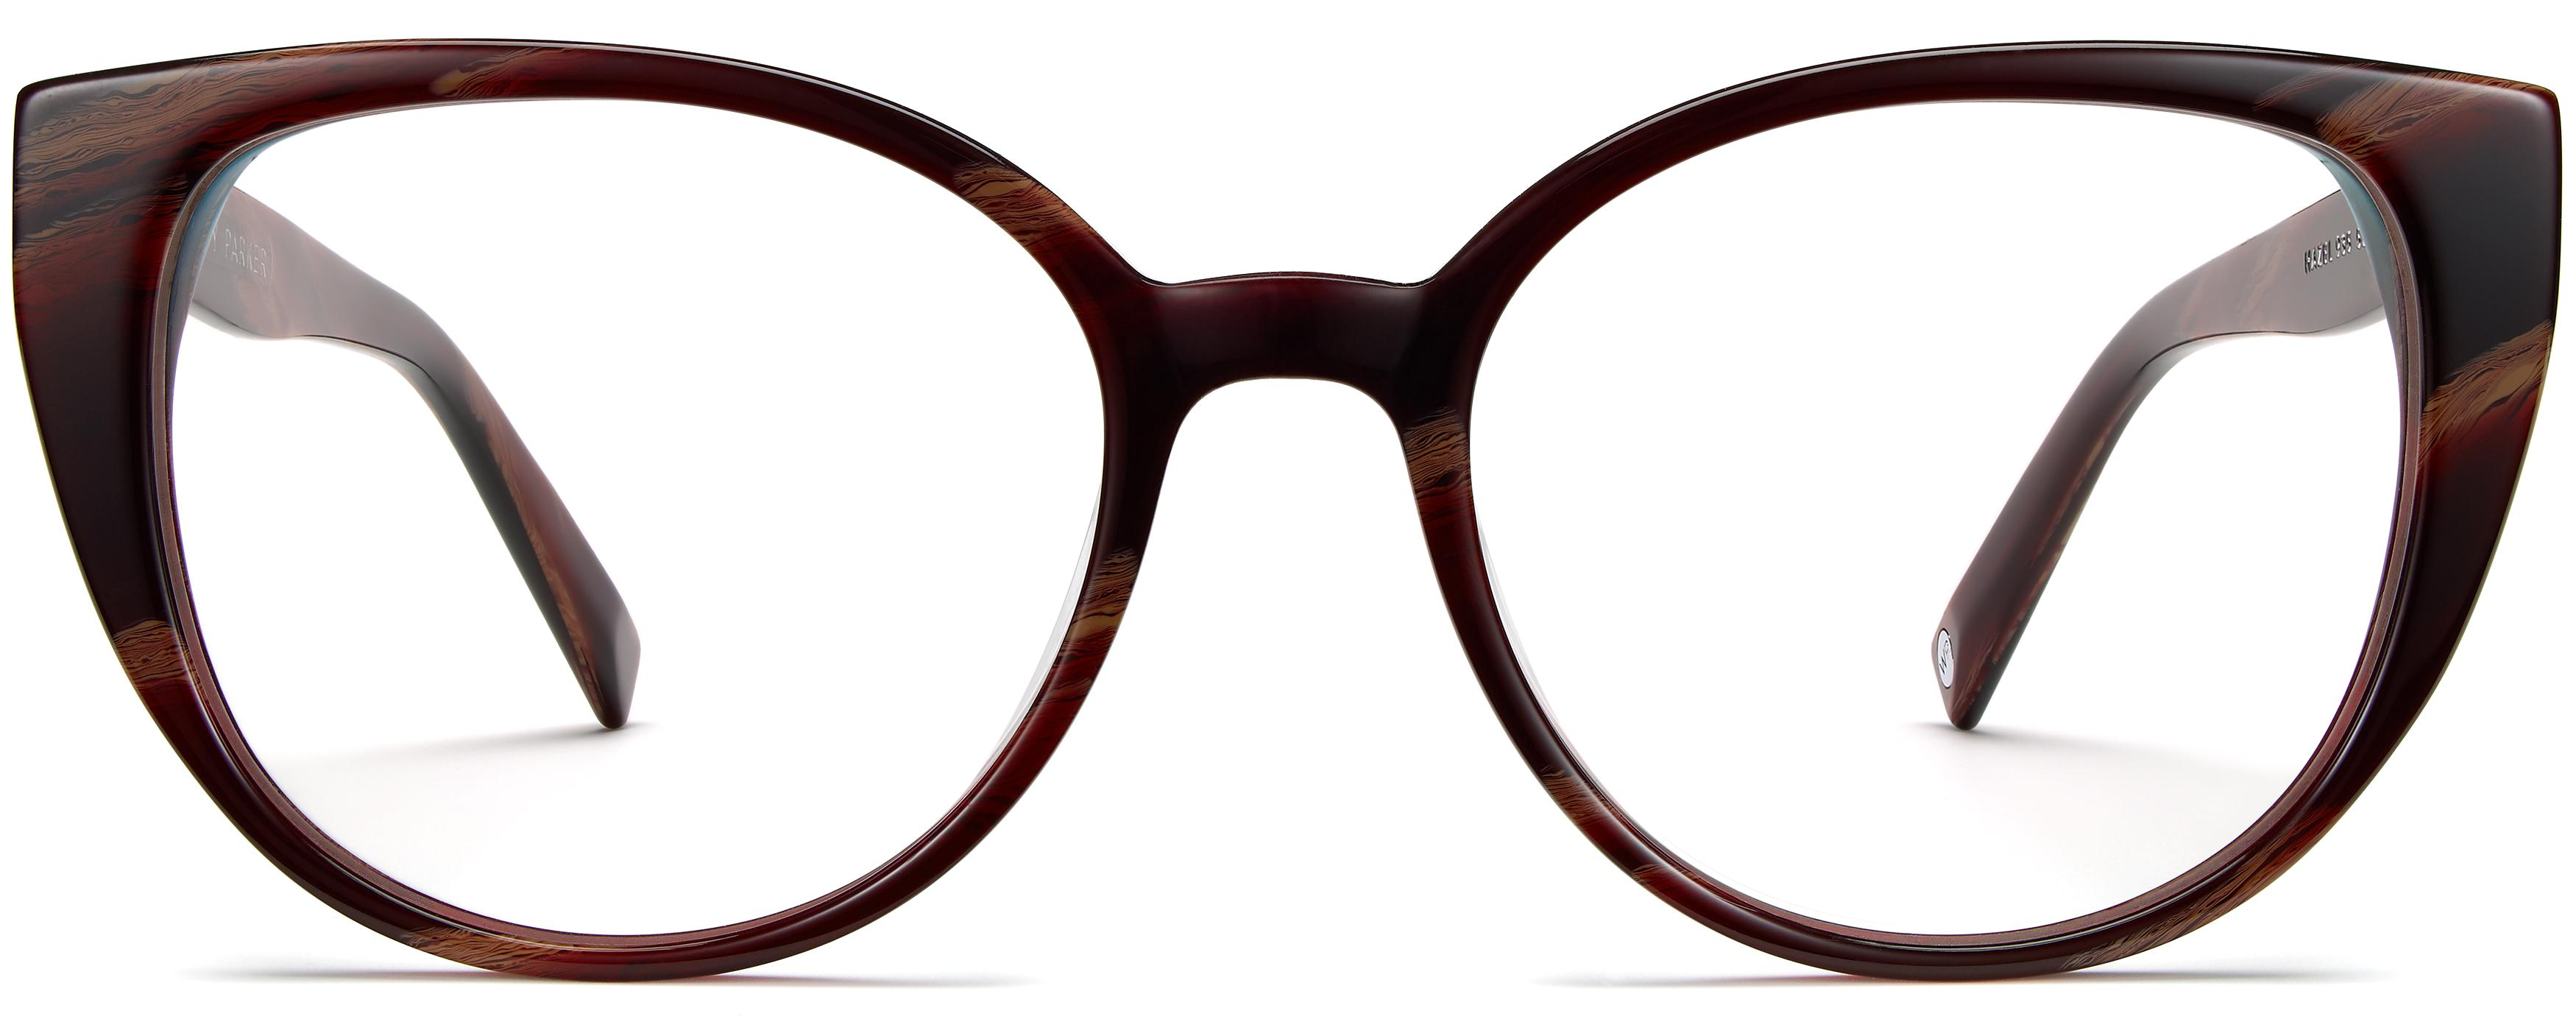 ec44576bc211 Women's Eyeglasses | Warby Parker